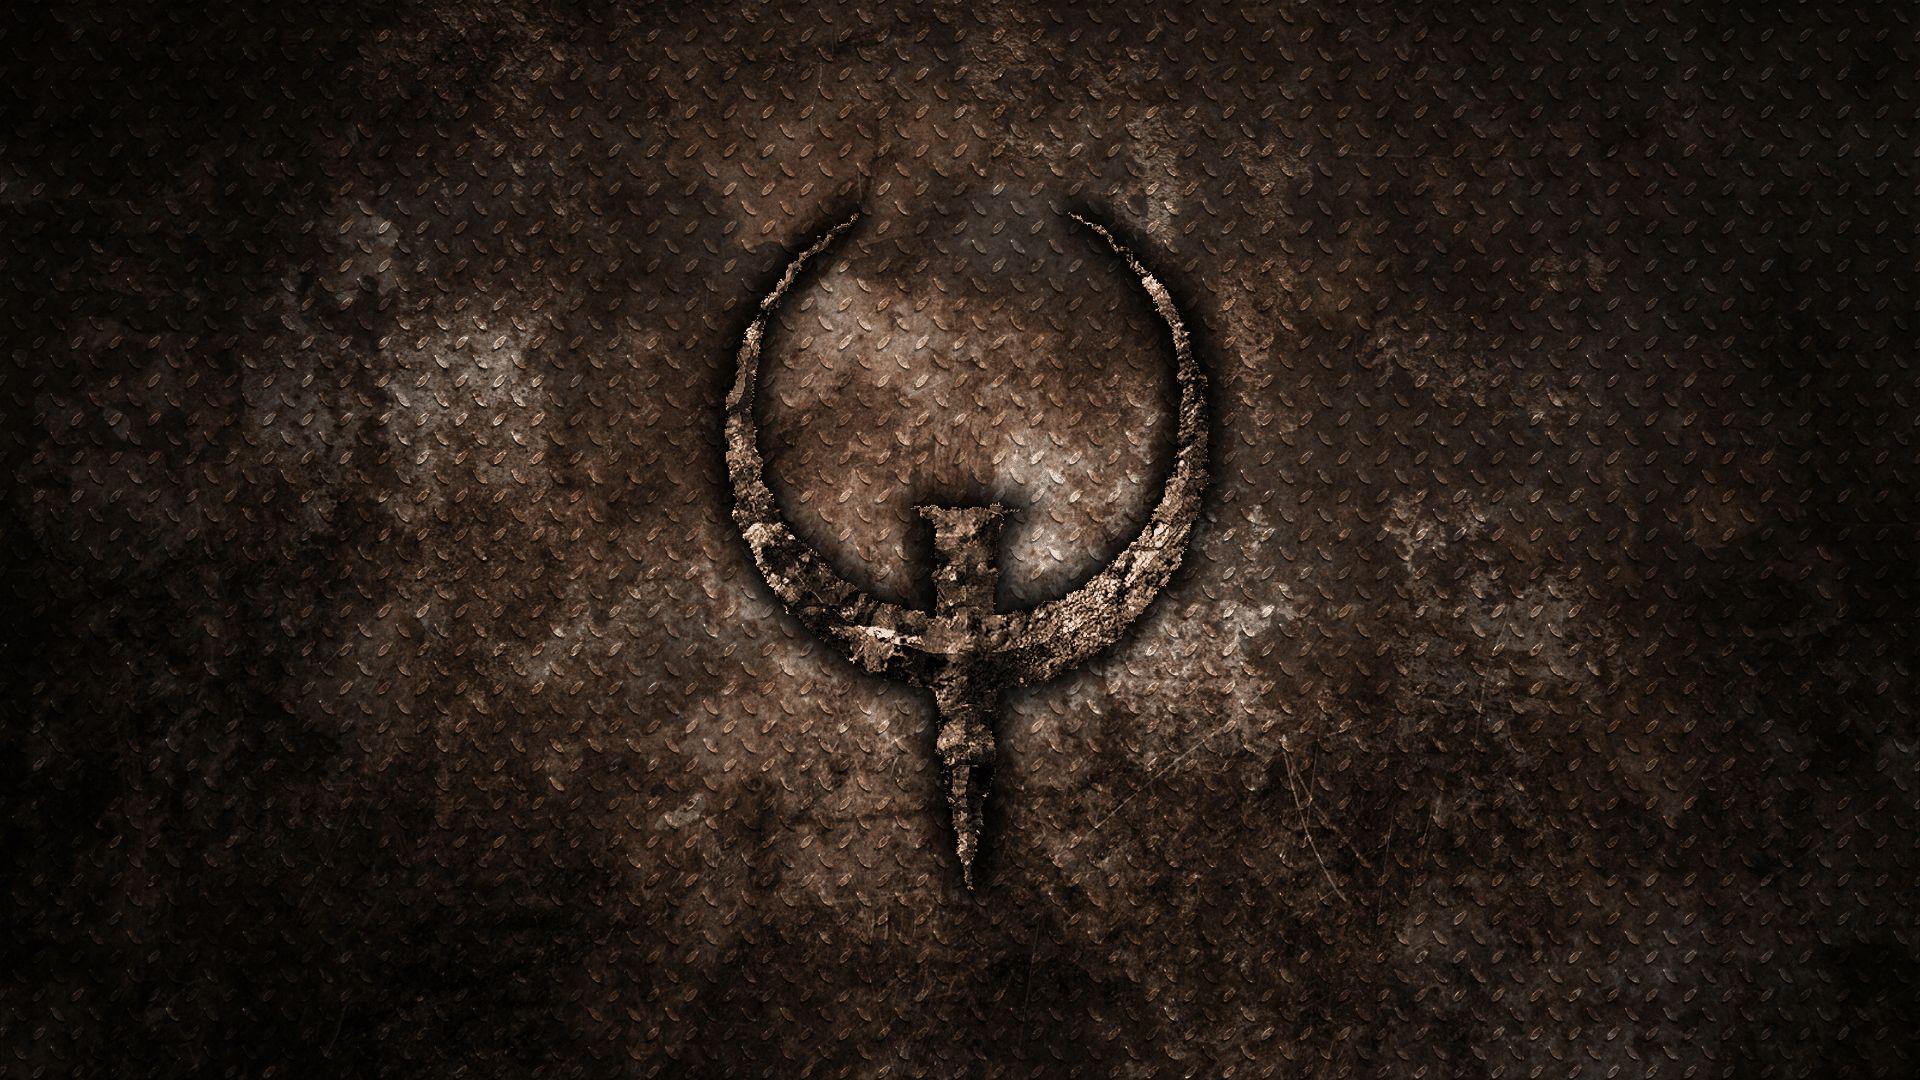 Logo Quake Wallpapers